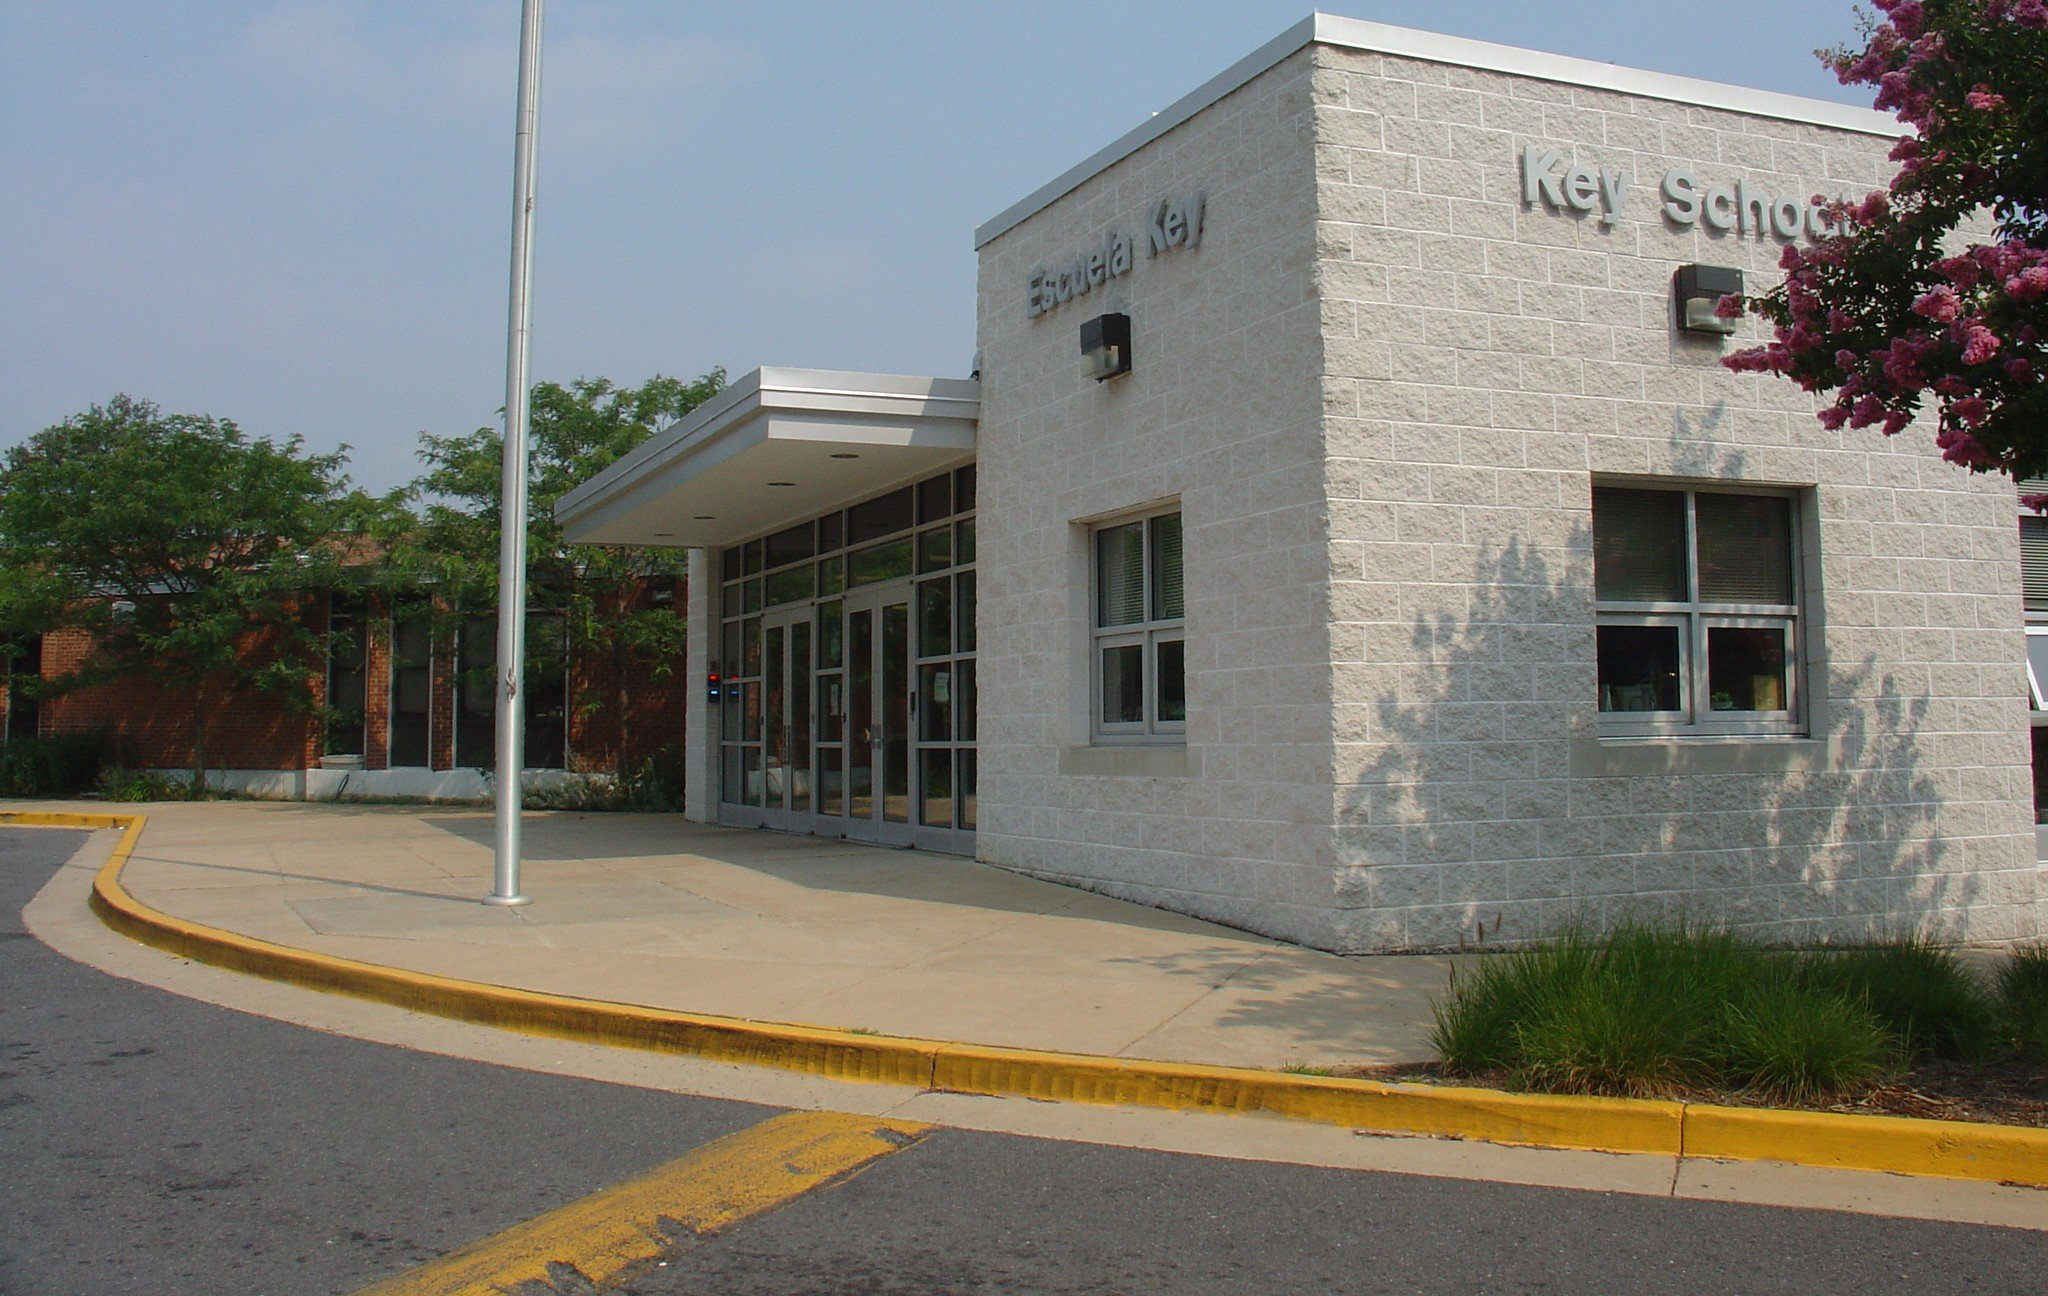 Key Elementary